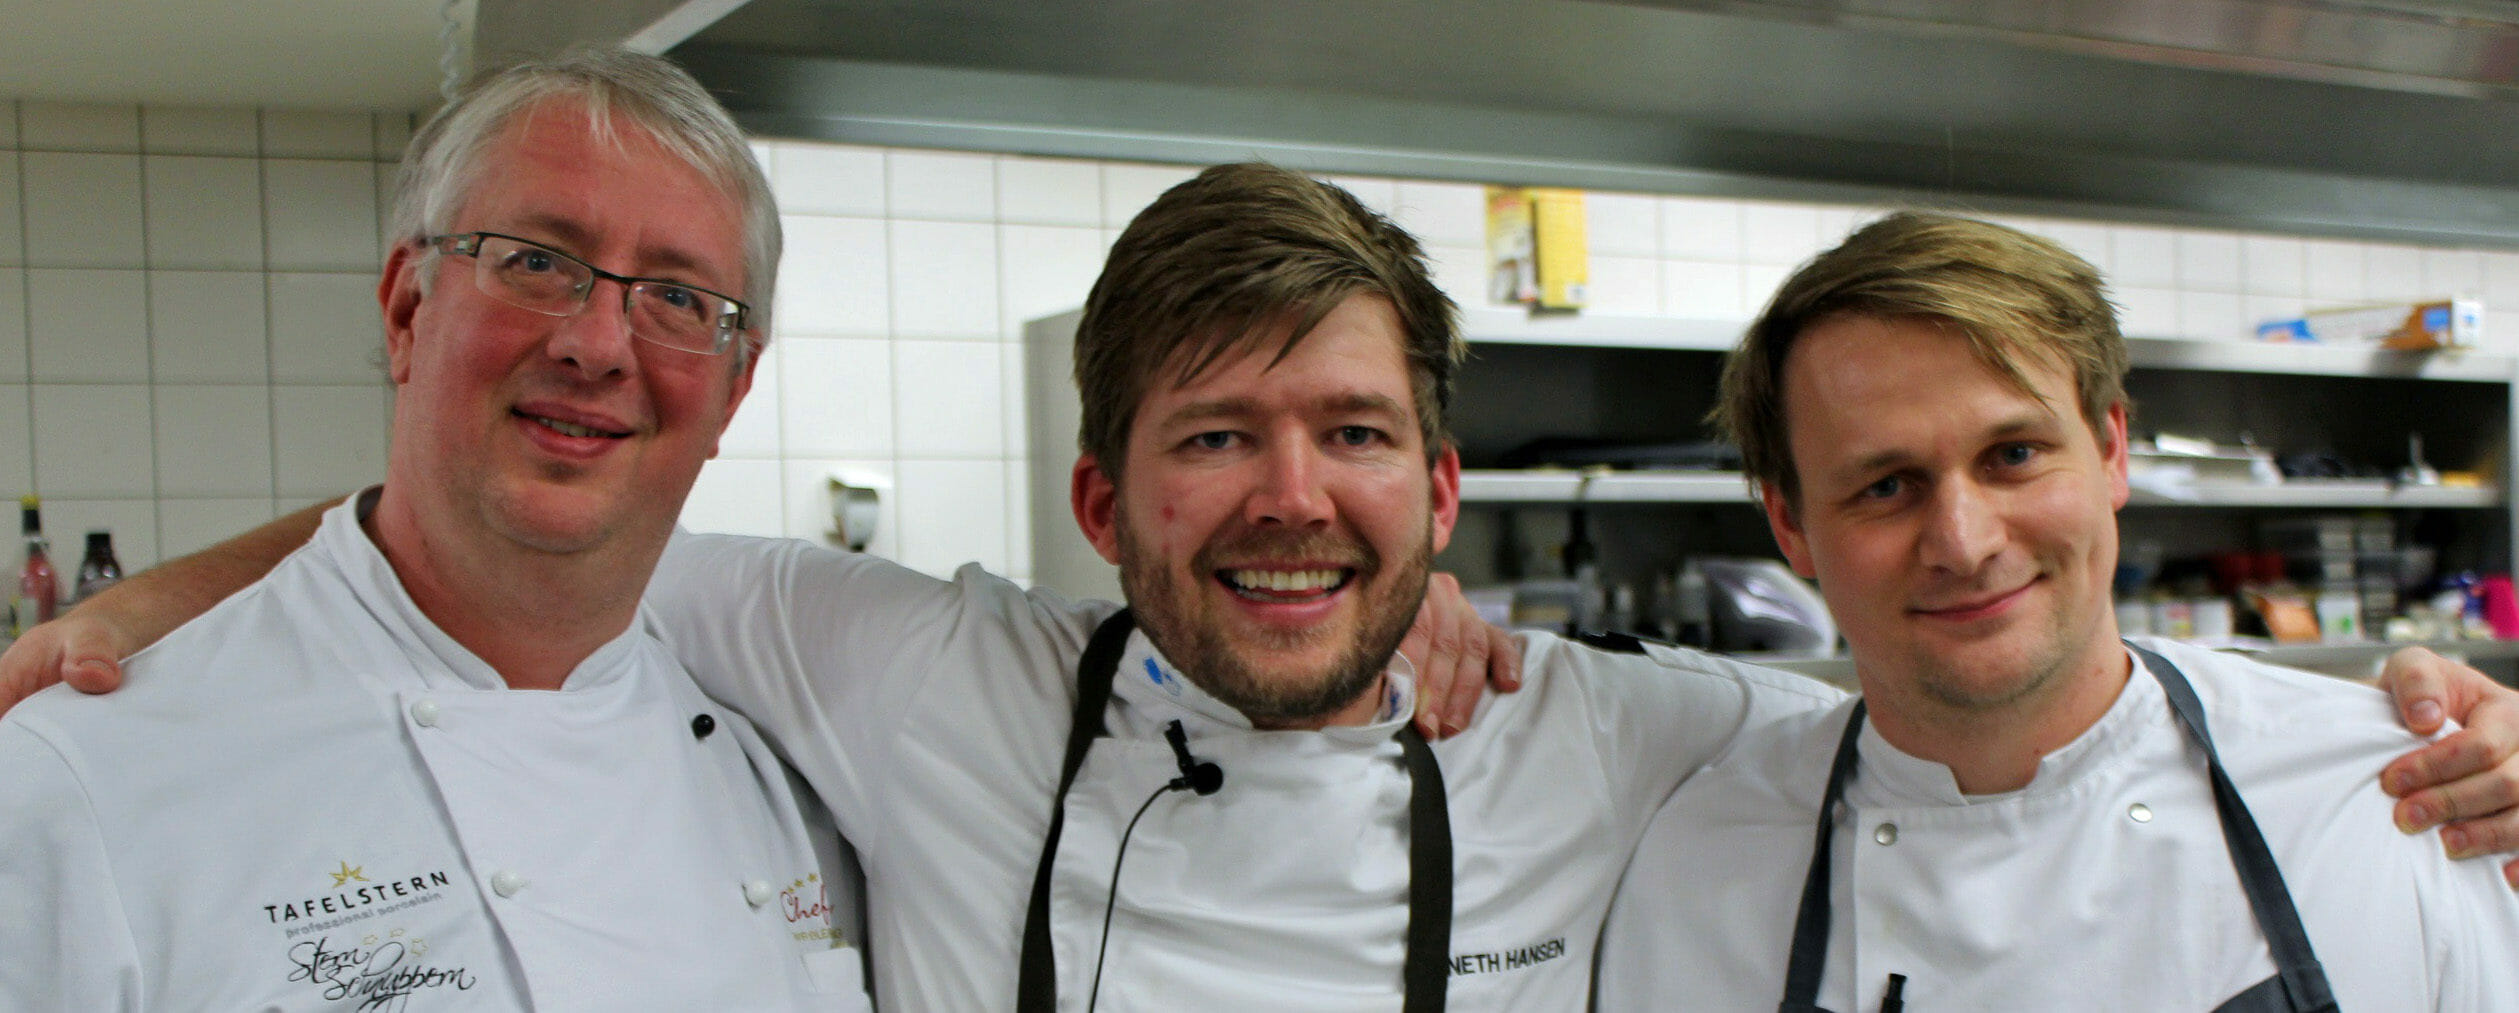 Gourmetfestival: Jammerbugten møder Vadehavet